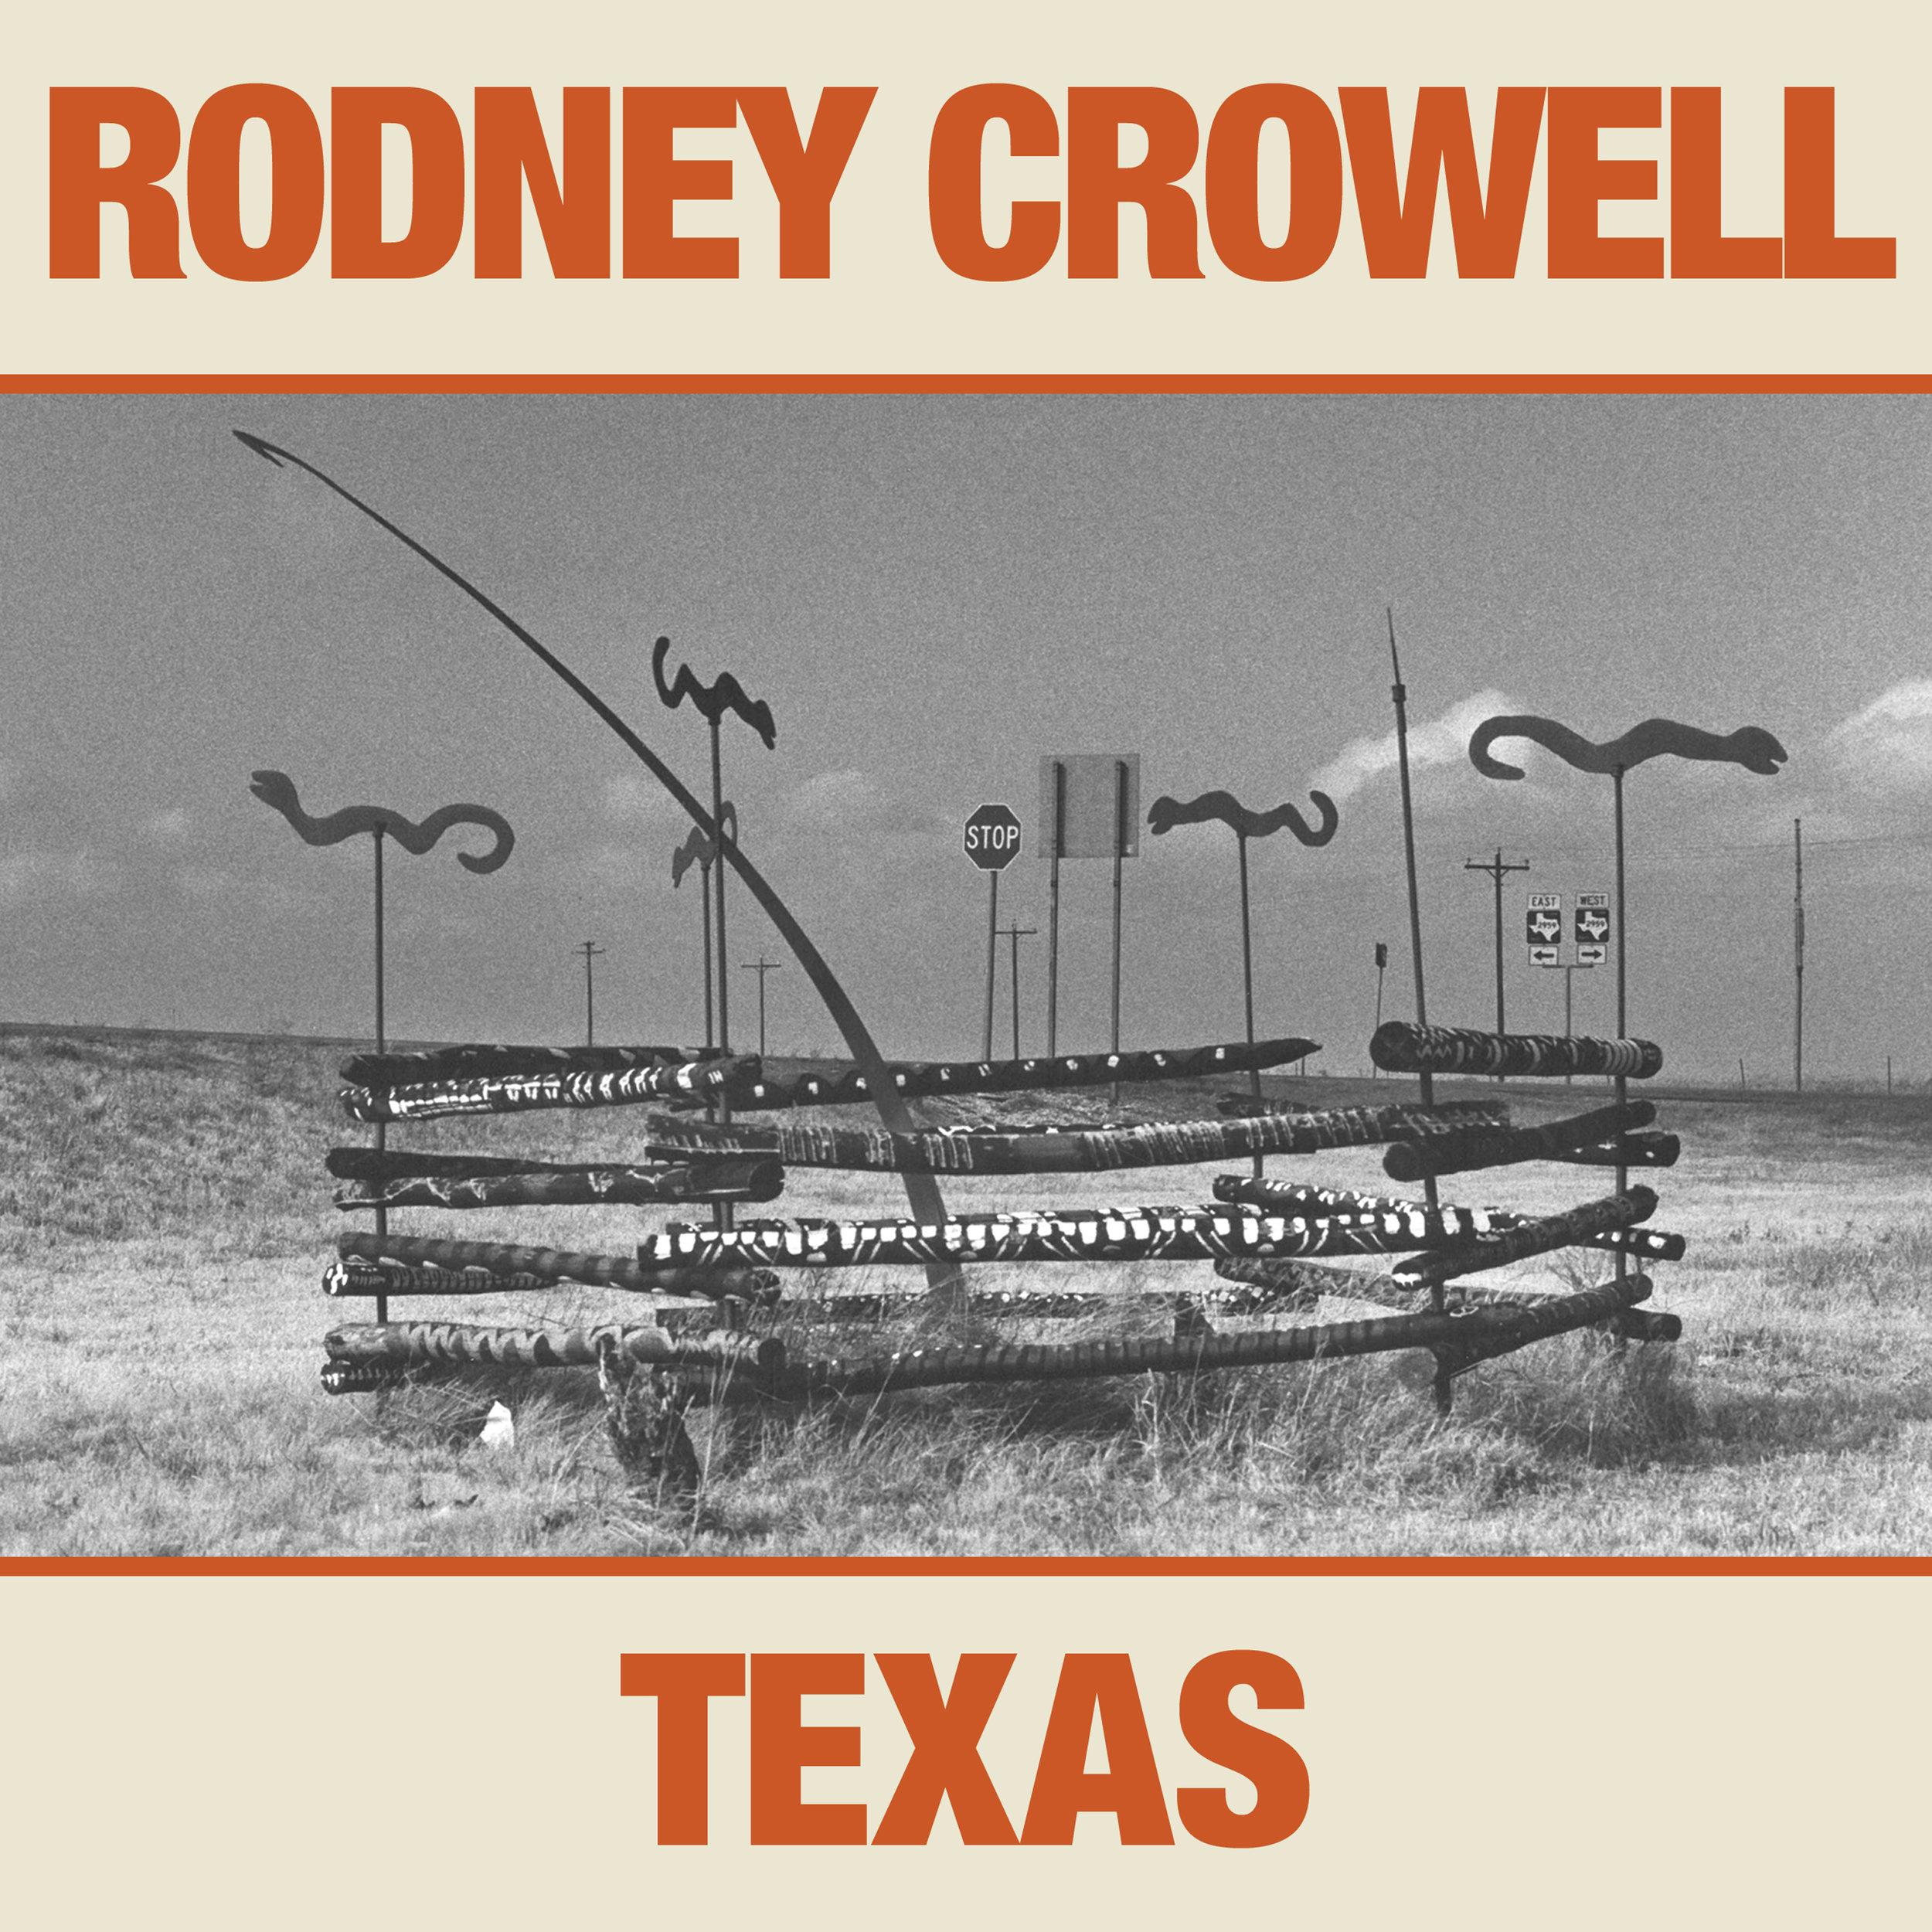 rodney_crowell_texas_cover.jpg